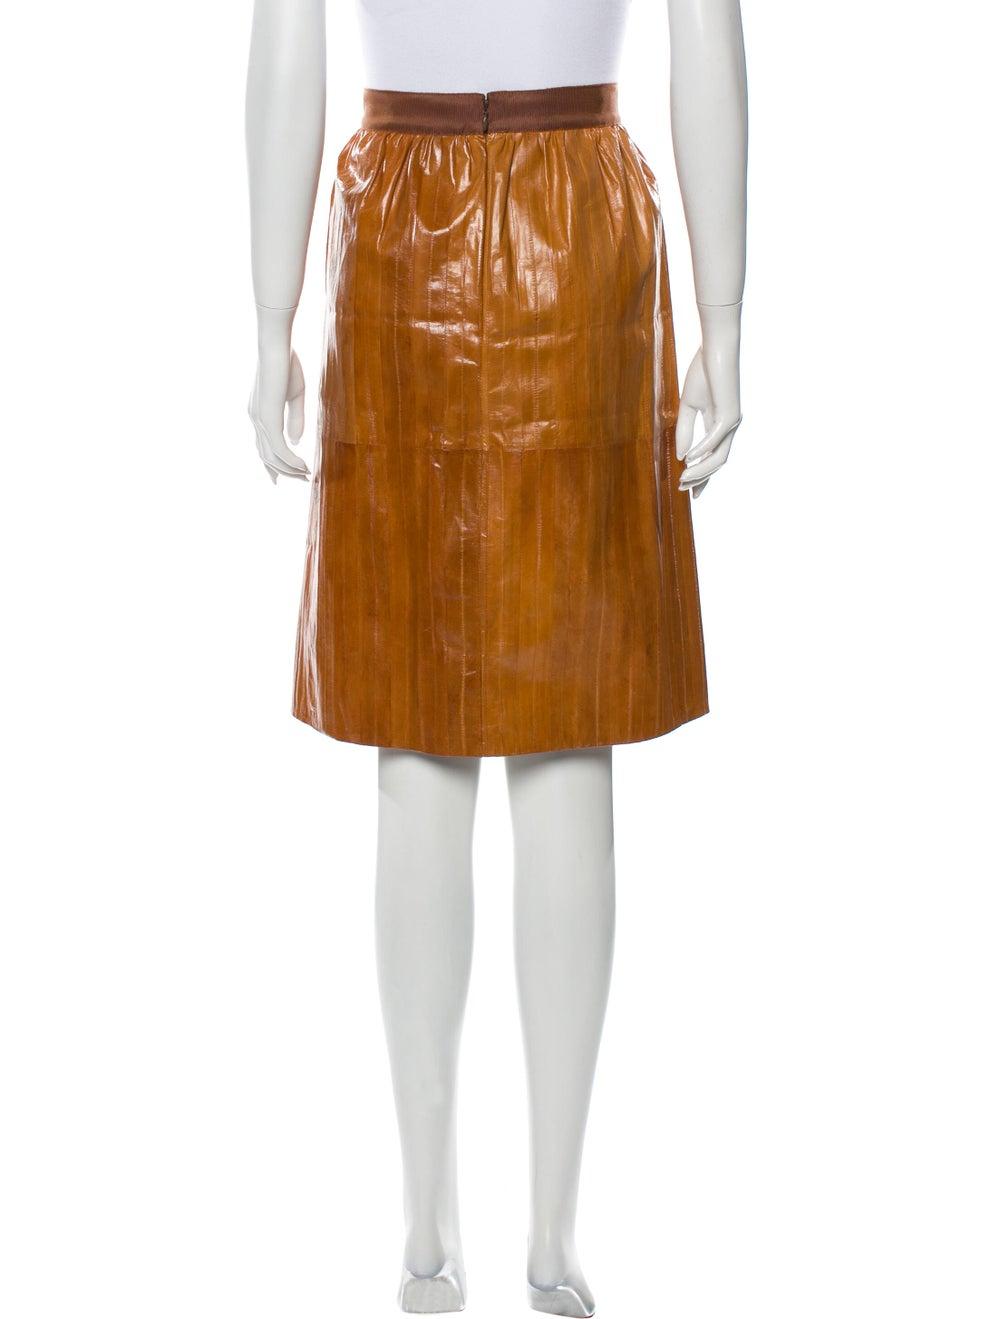 Rachel Comey Eel Skin Knee-Length Skirt - image 3